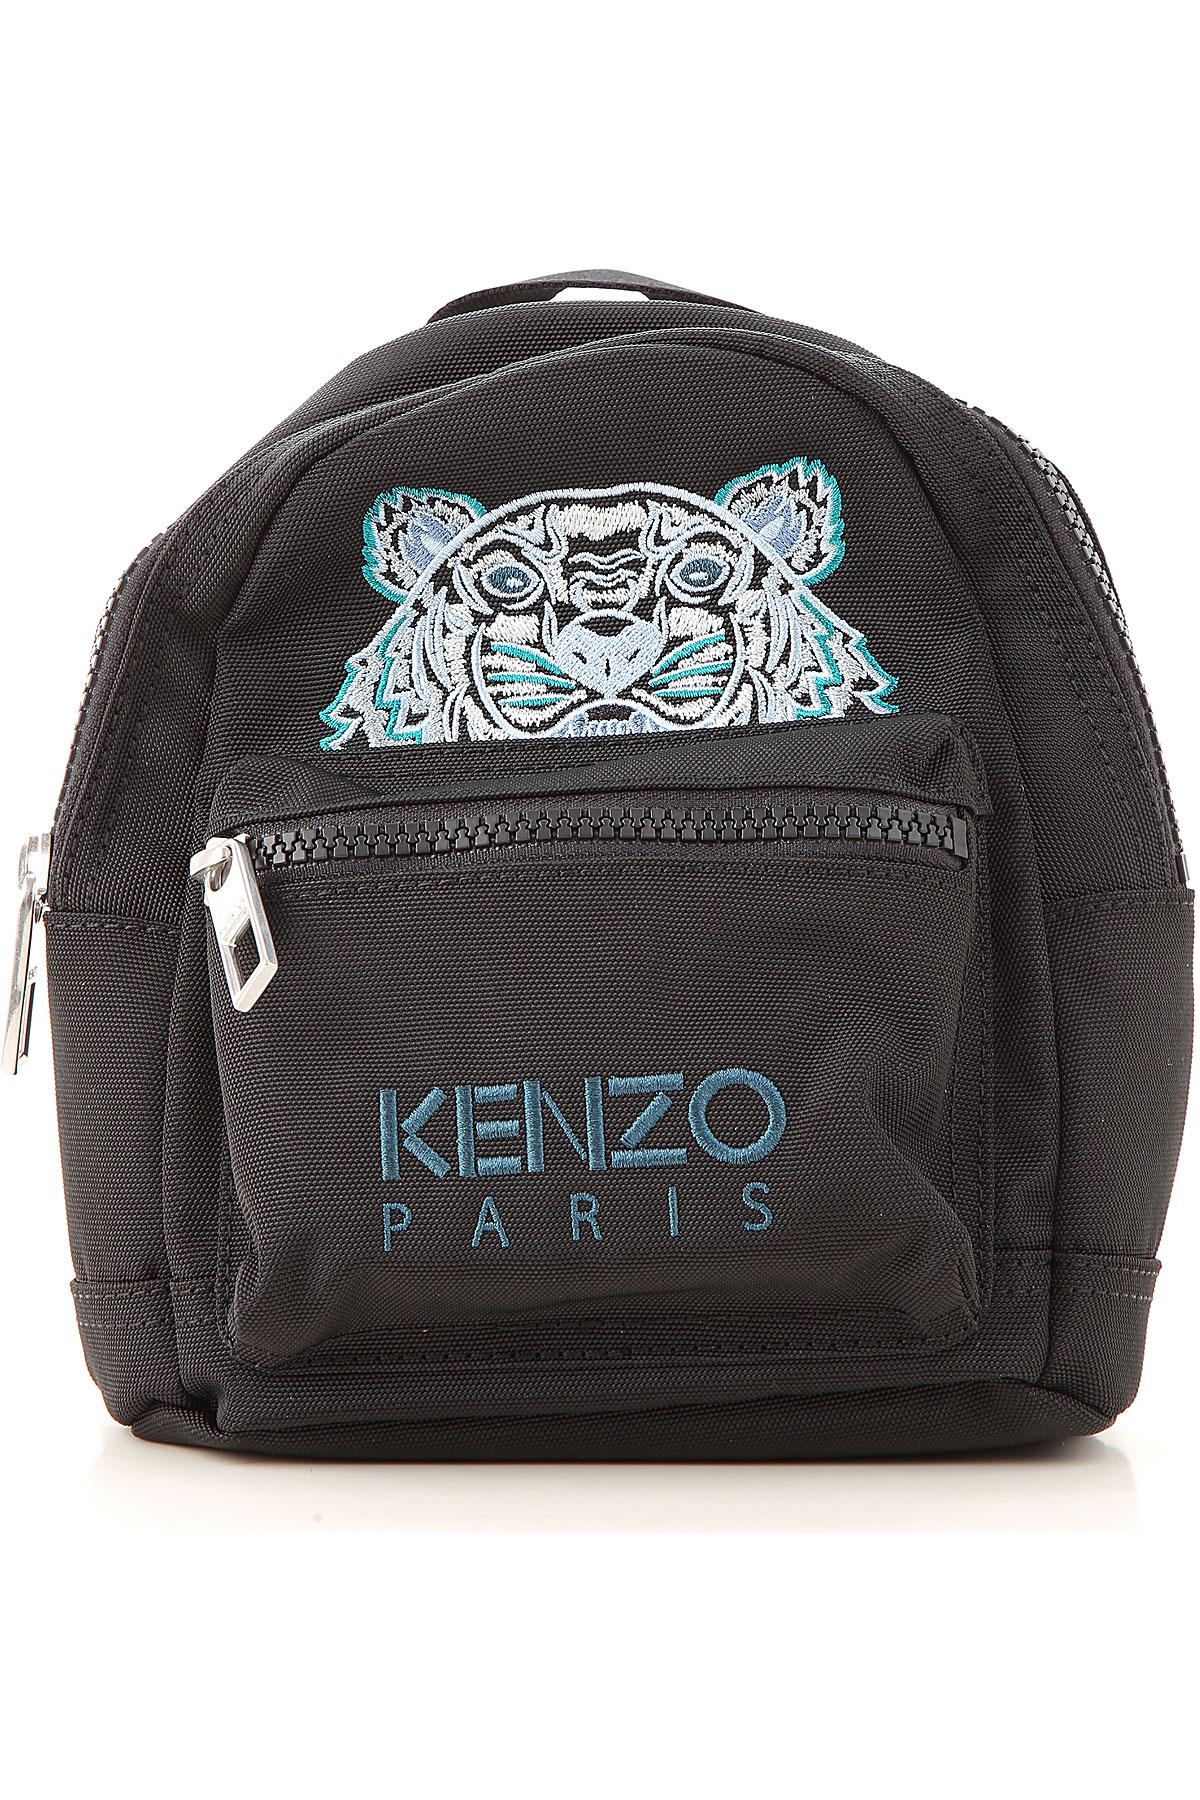 Kenzo Backpack for Men On Sale, Black, polyester, 2019